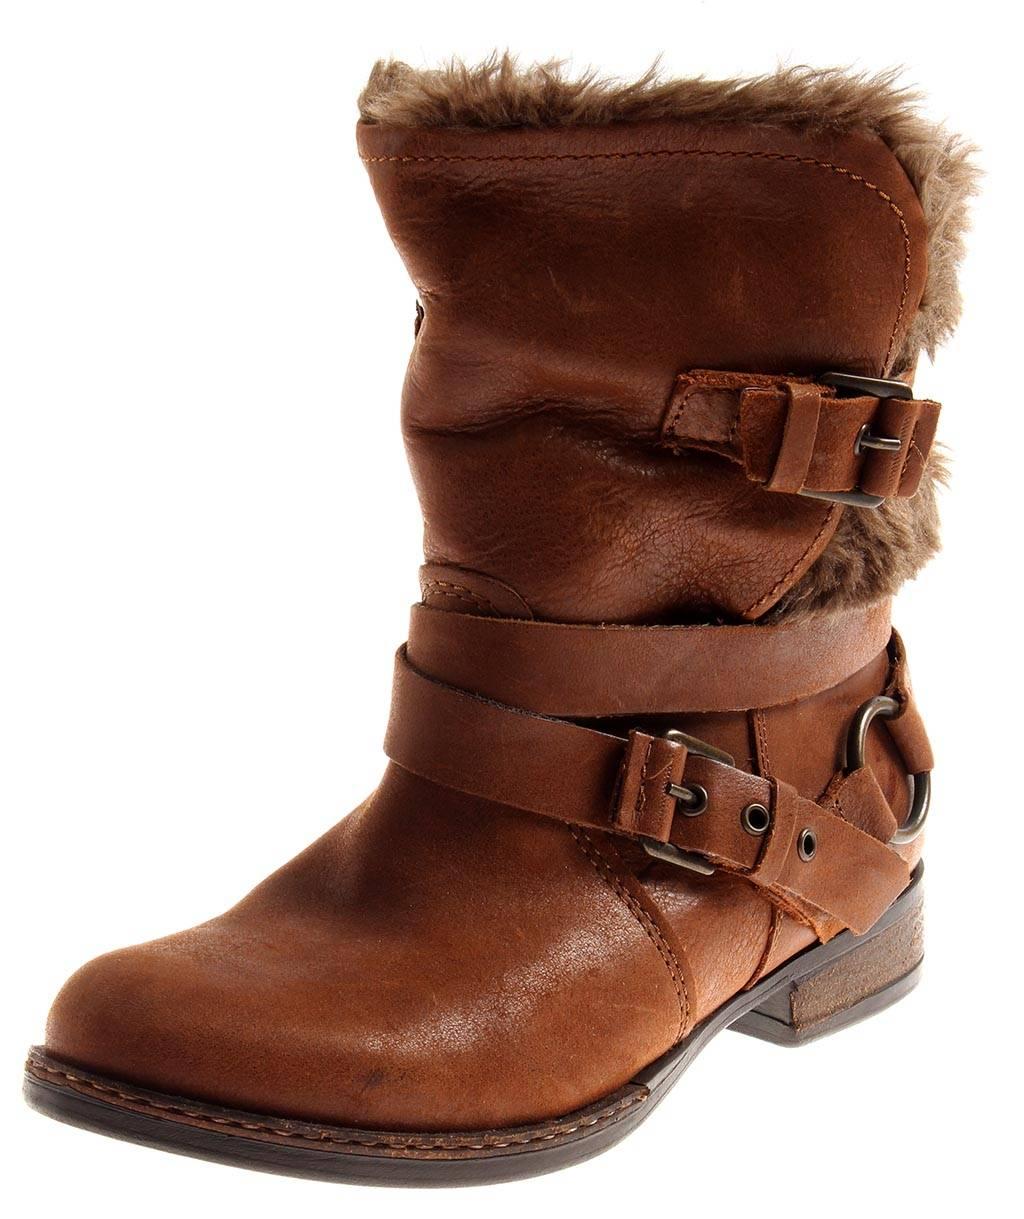 Bullboxer warme gefüttert Lederstiefelette Leder Schuhe Damen gefüttert warme cognac 2292 768455